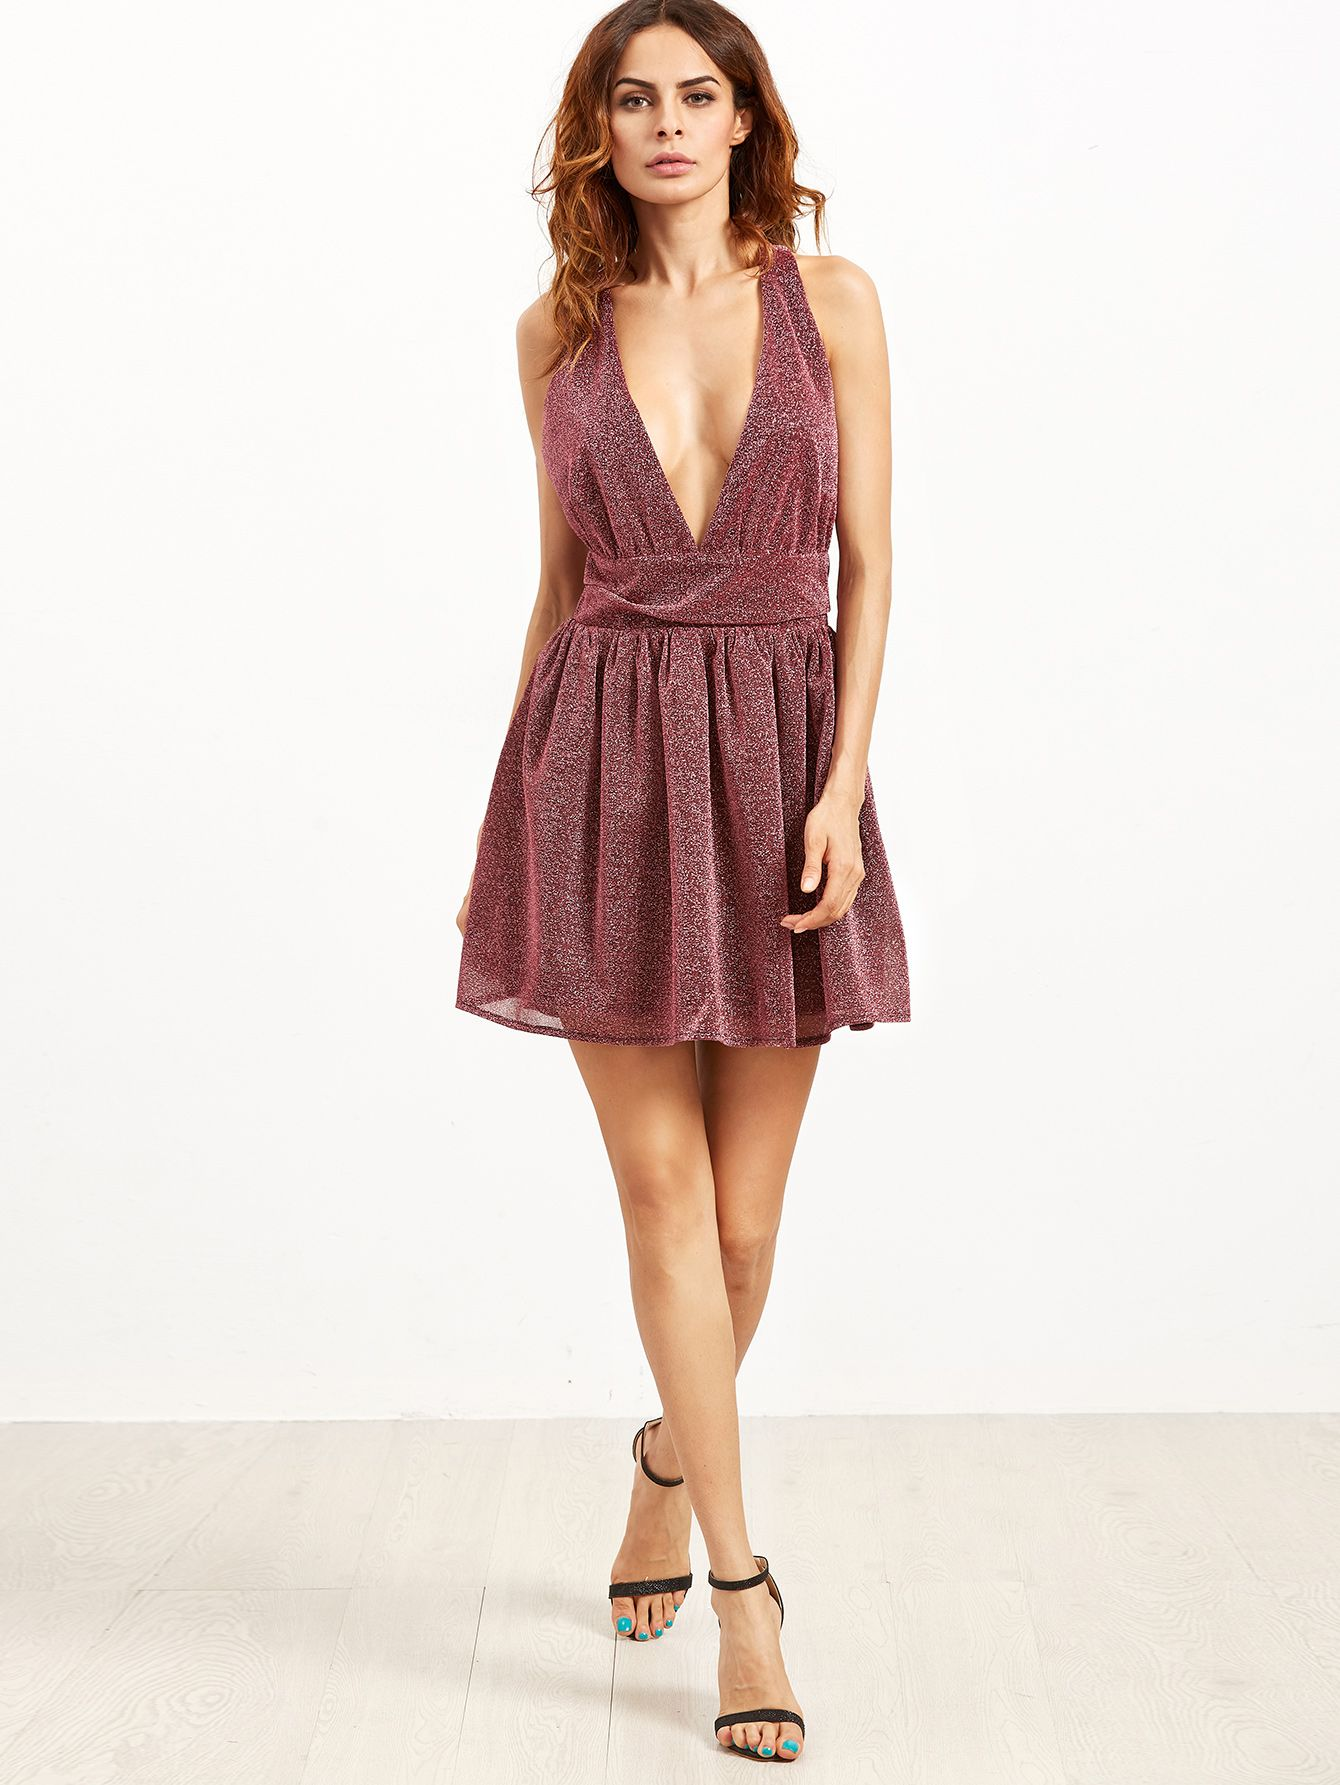 Burgundy Deep V Neck Sleeveless Sparkle Detail Party Dress -SheIn(Sheinside) 95feff5956d